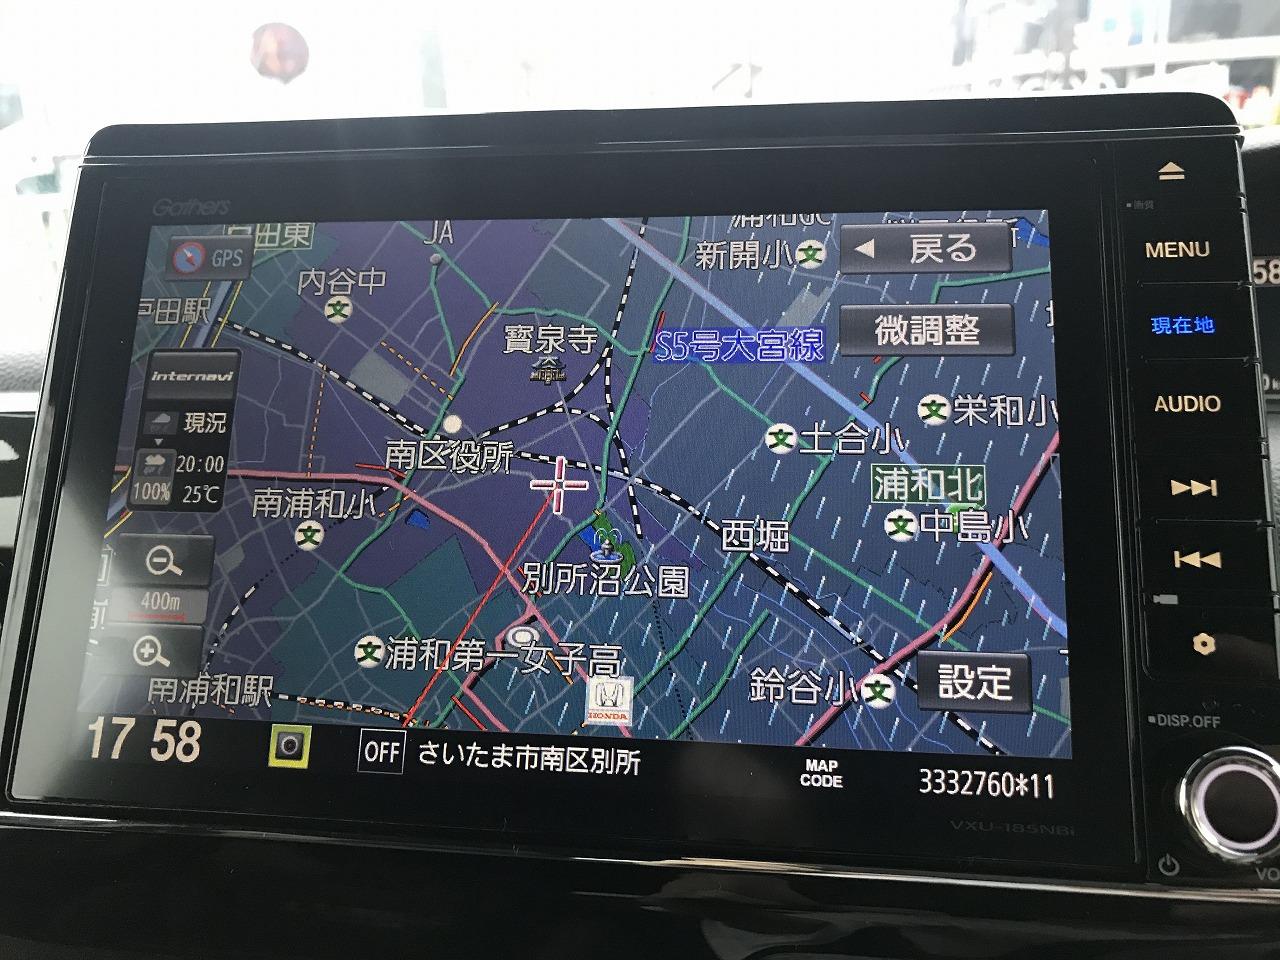 N-BOXのホンダ純正8インチインターナビ「VXU-185NBi」の地図に雨が表示されて見づらいので消してみた^^;